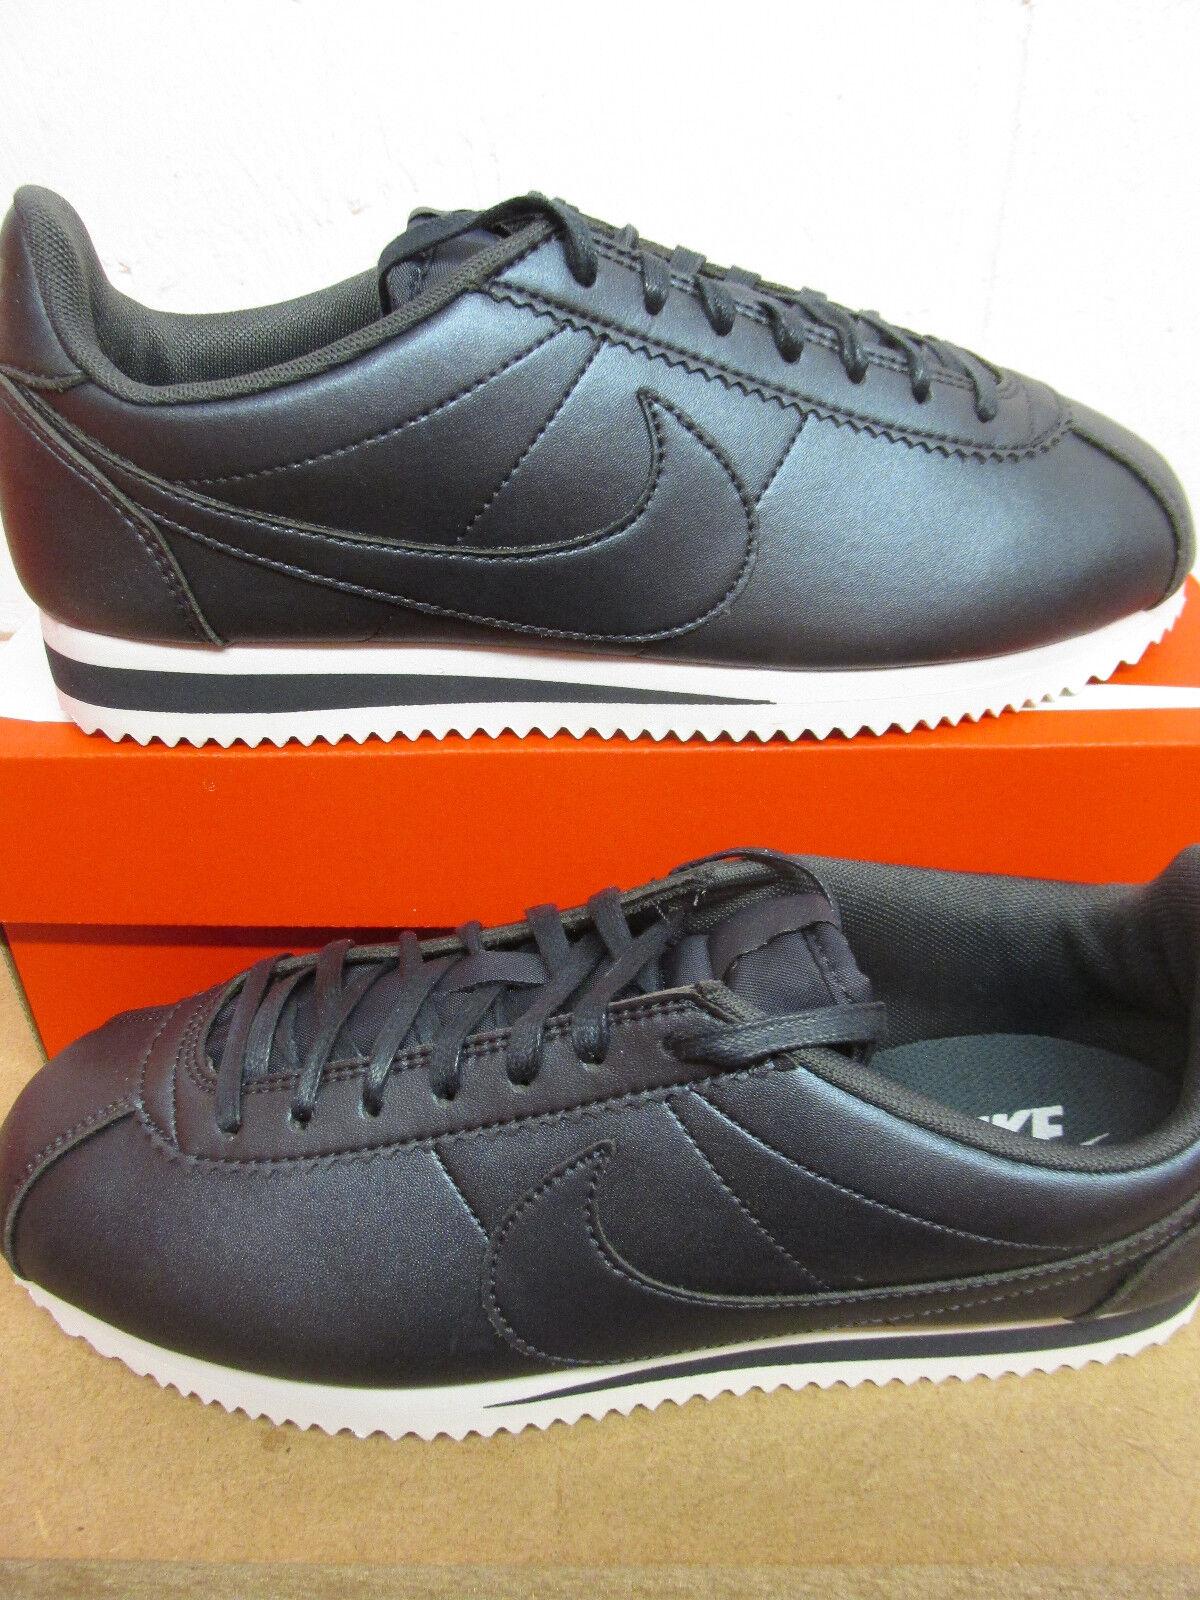 Nike damen classic cortez leather trainers 807471 004 Turnschuhe schuhe